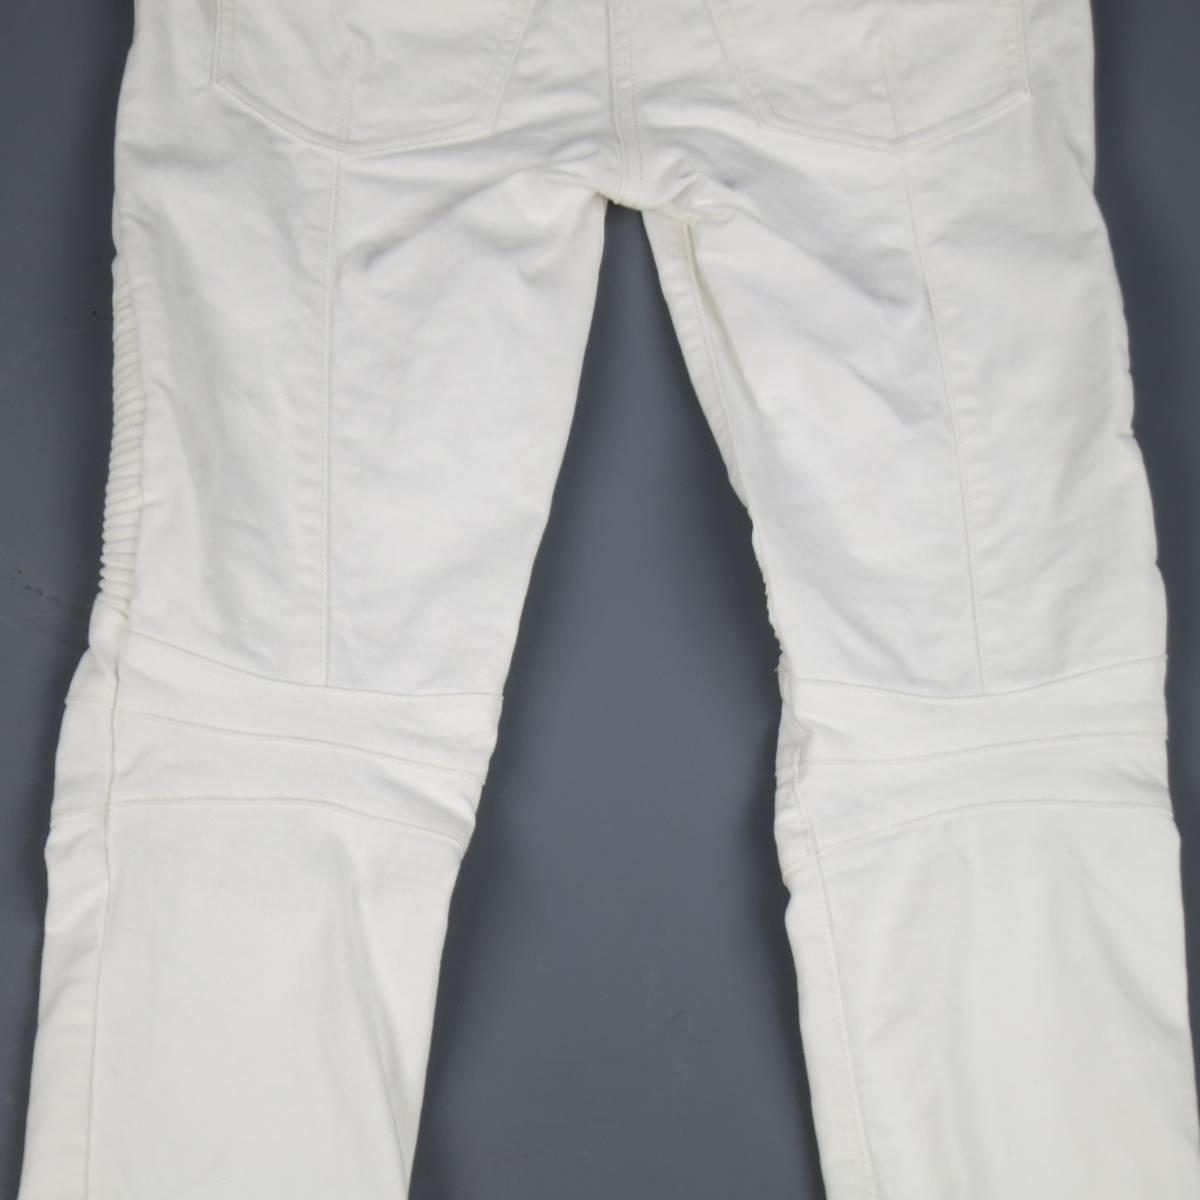 78693eaec016 BALMAIN Jeans Size 4 White Cotton Gold Zip Moto For Sale at 1stdibs